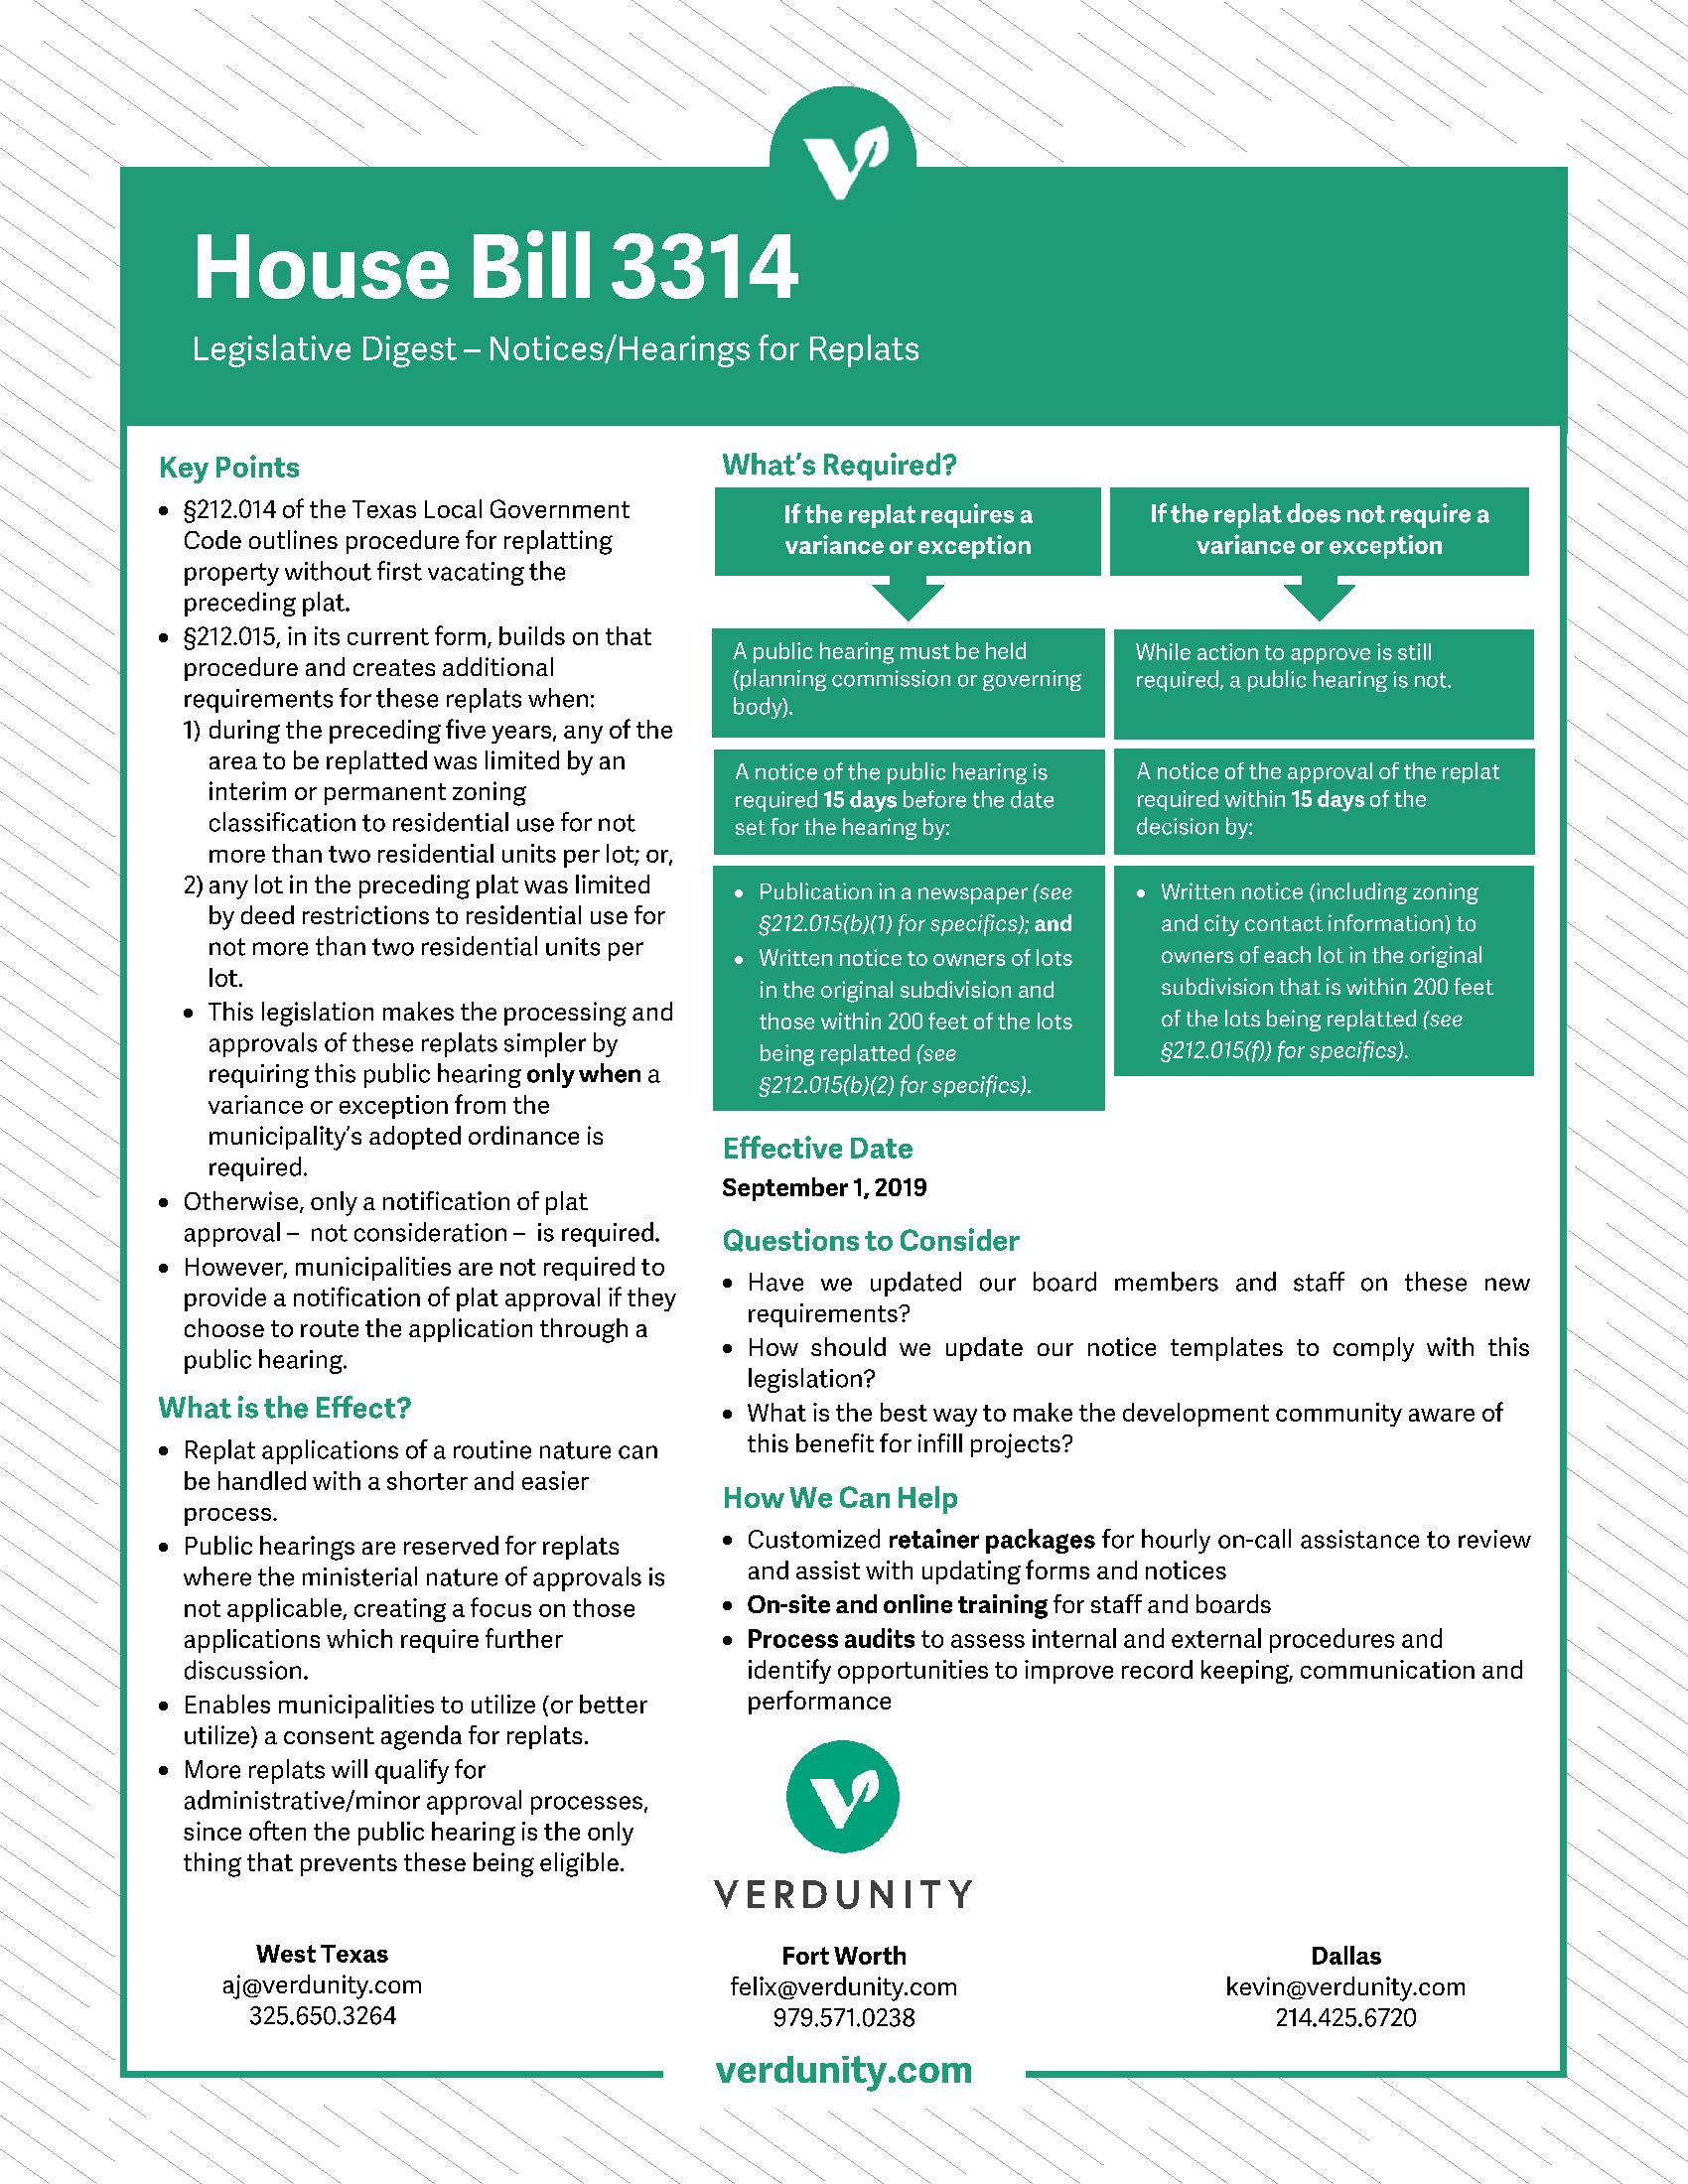 Legislative digest preview_HB3314.jpg